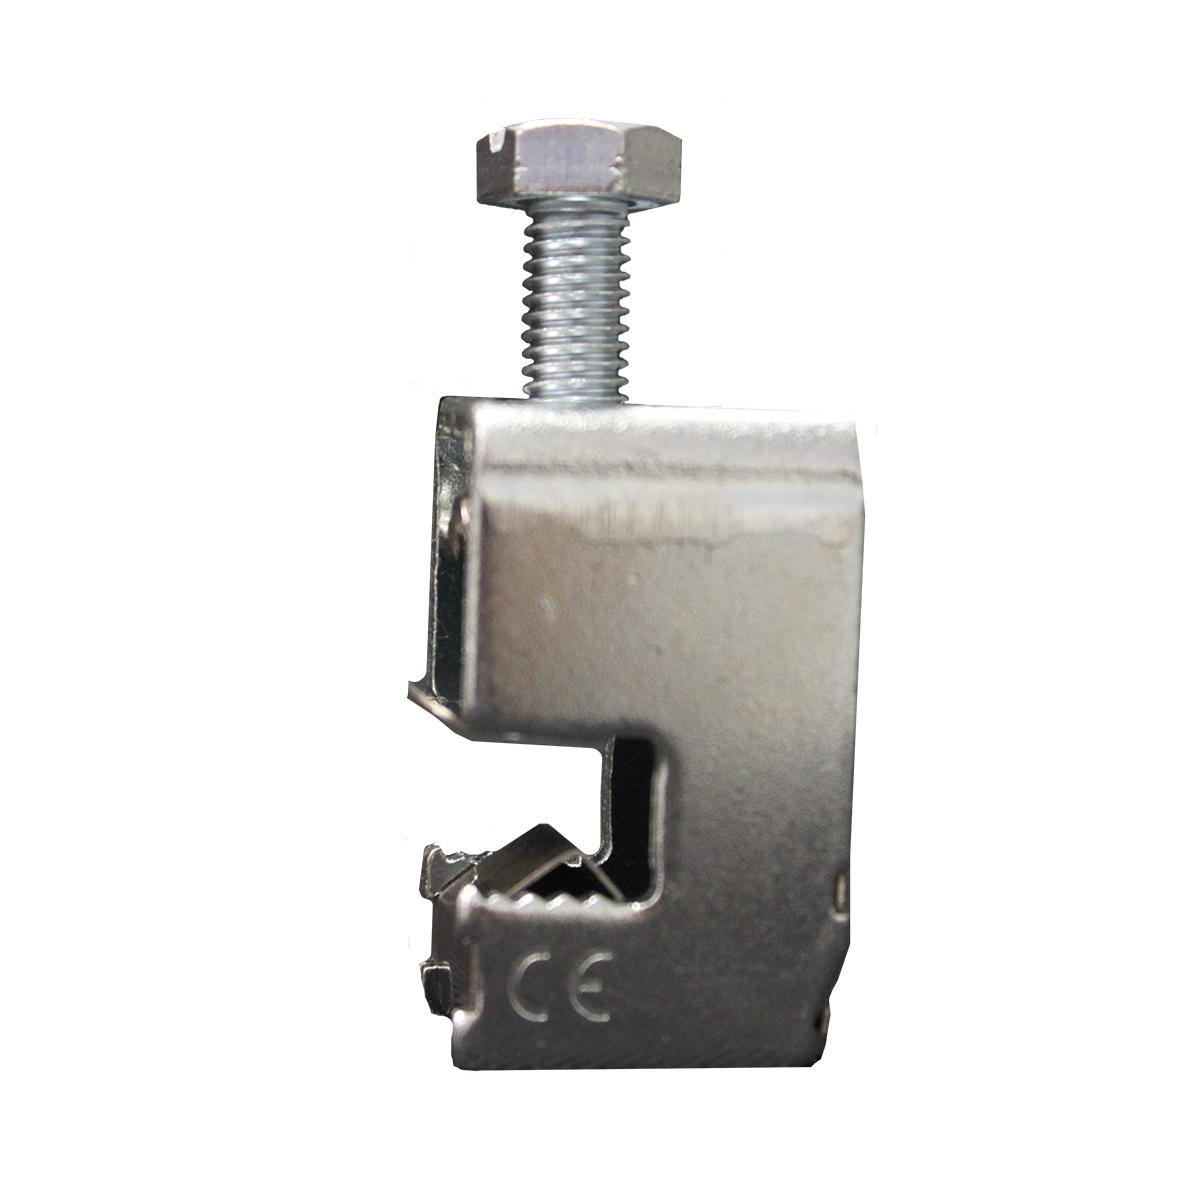 1 Stk Alu-Kupfer-Leiteranschlußklemme 16 -70mm² / 5mm² IS5057005-